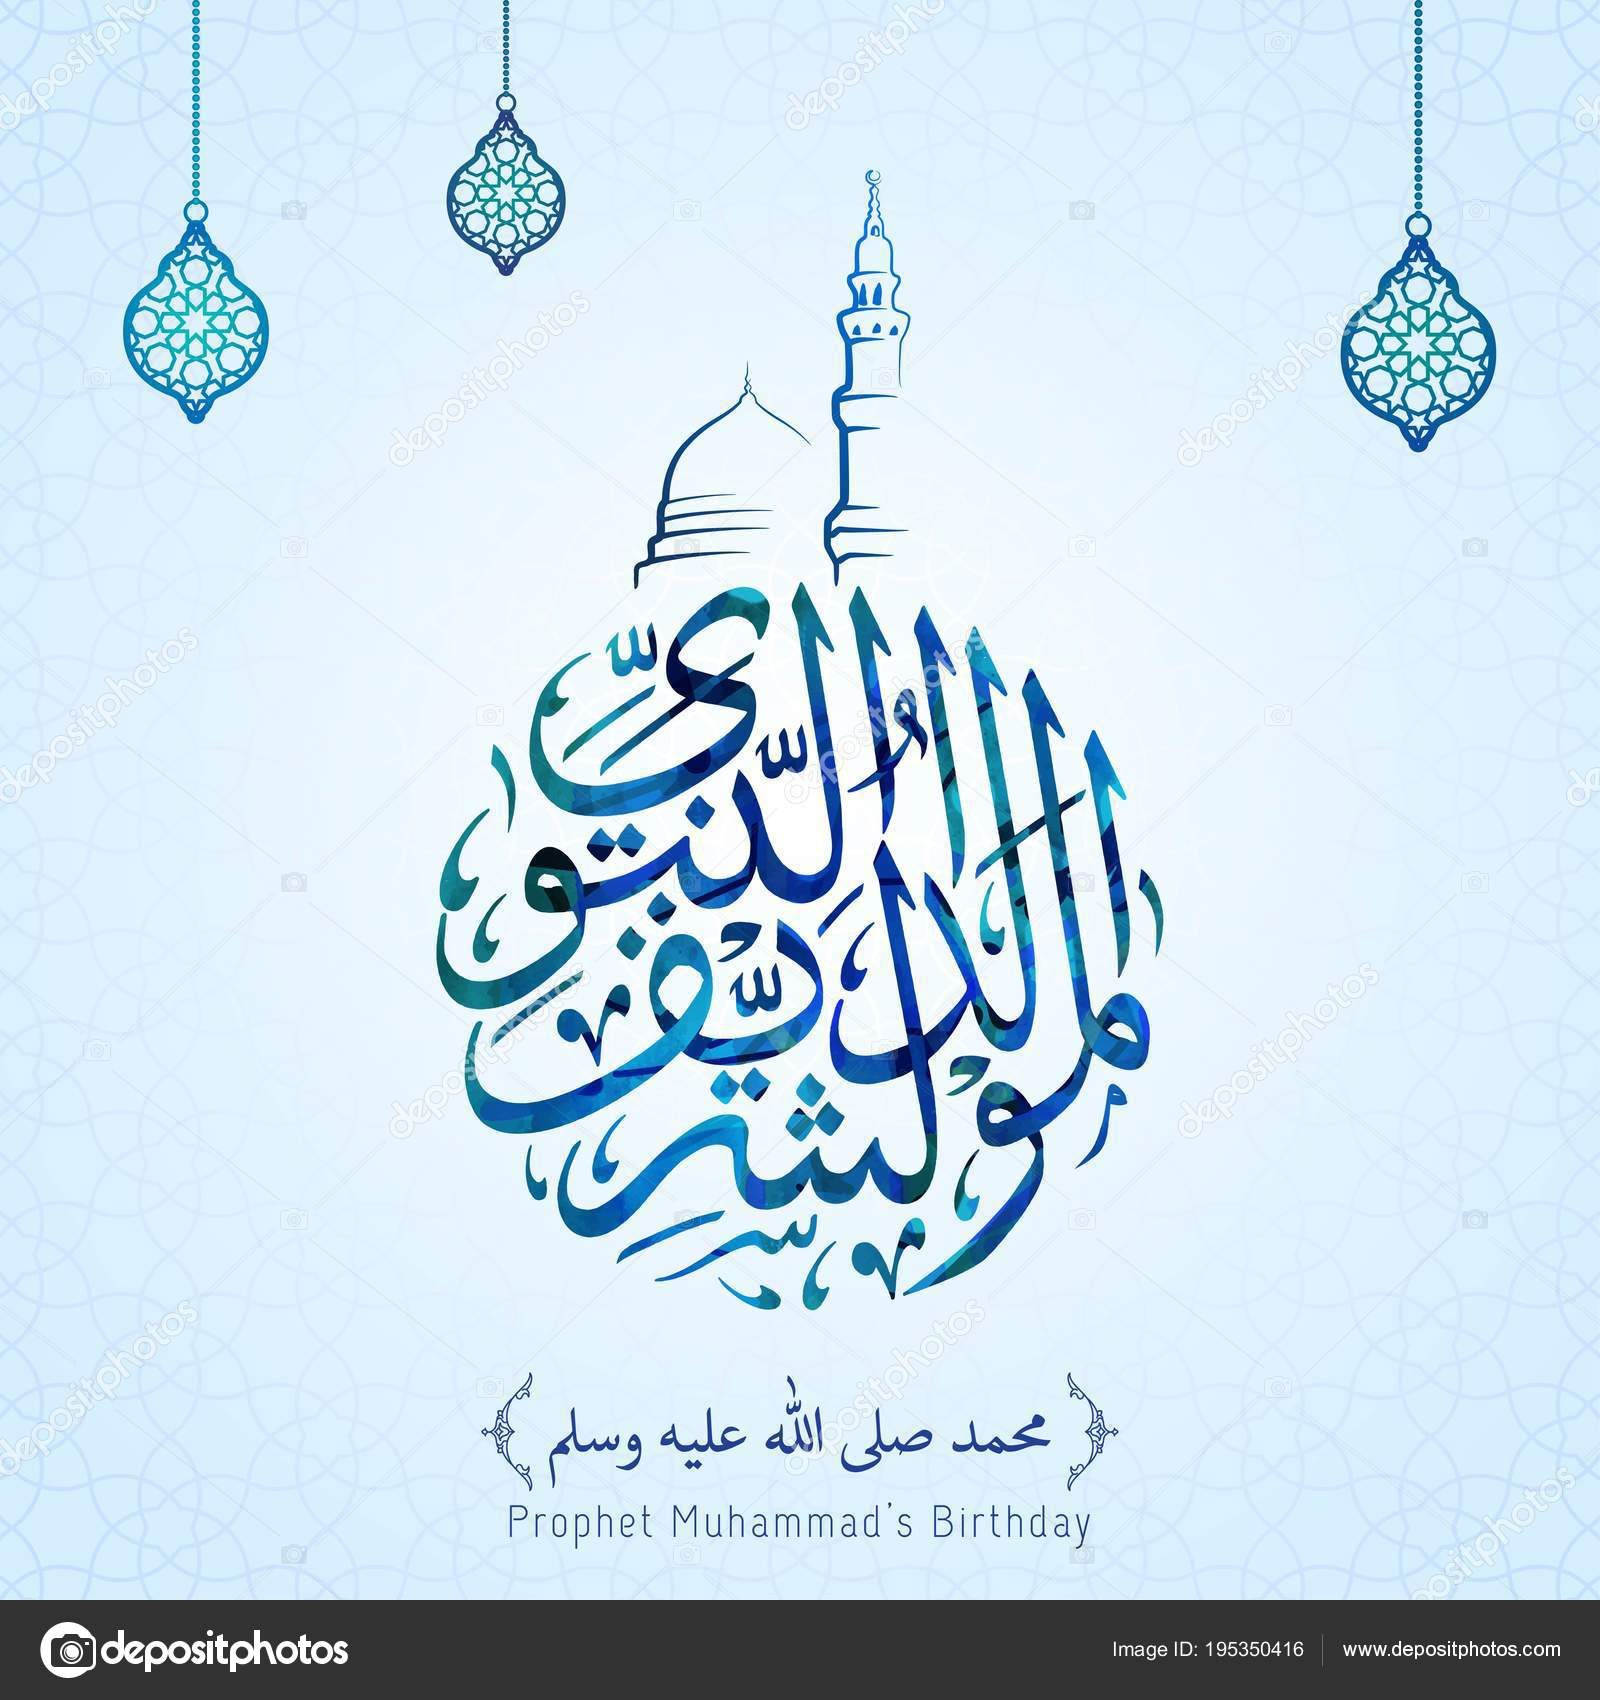 Feliz cumpleanos an arabe